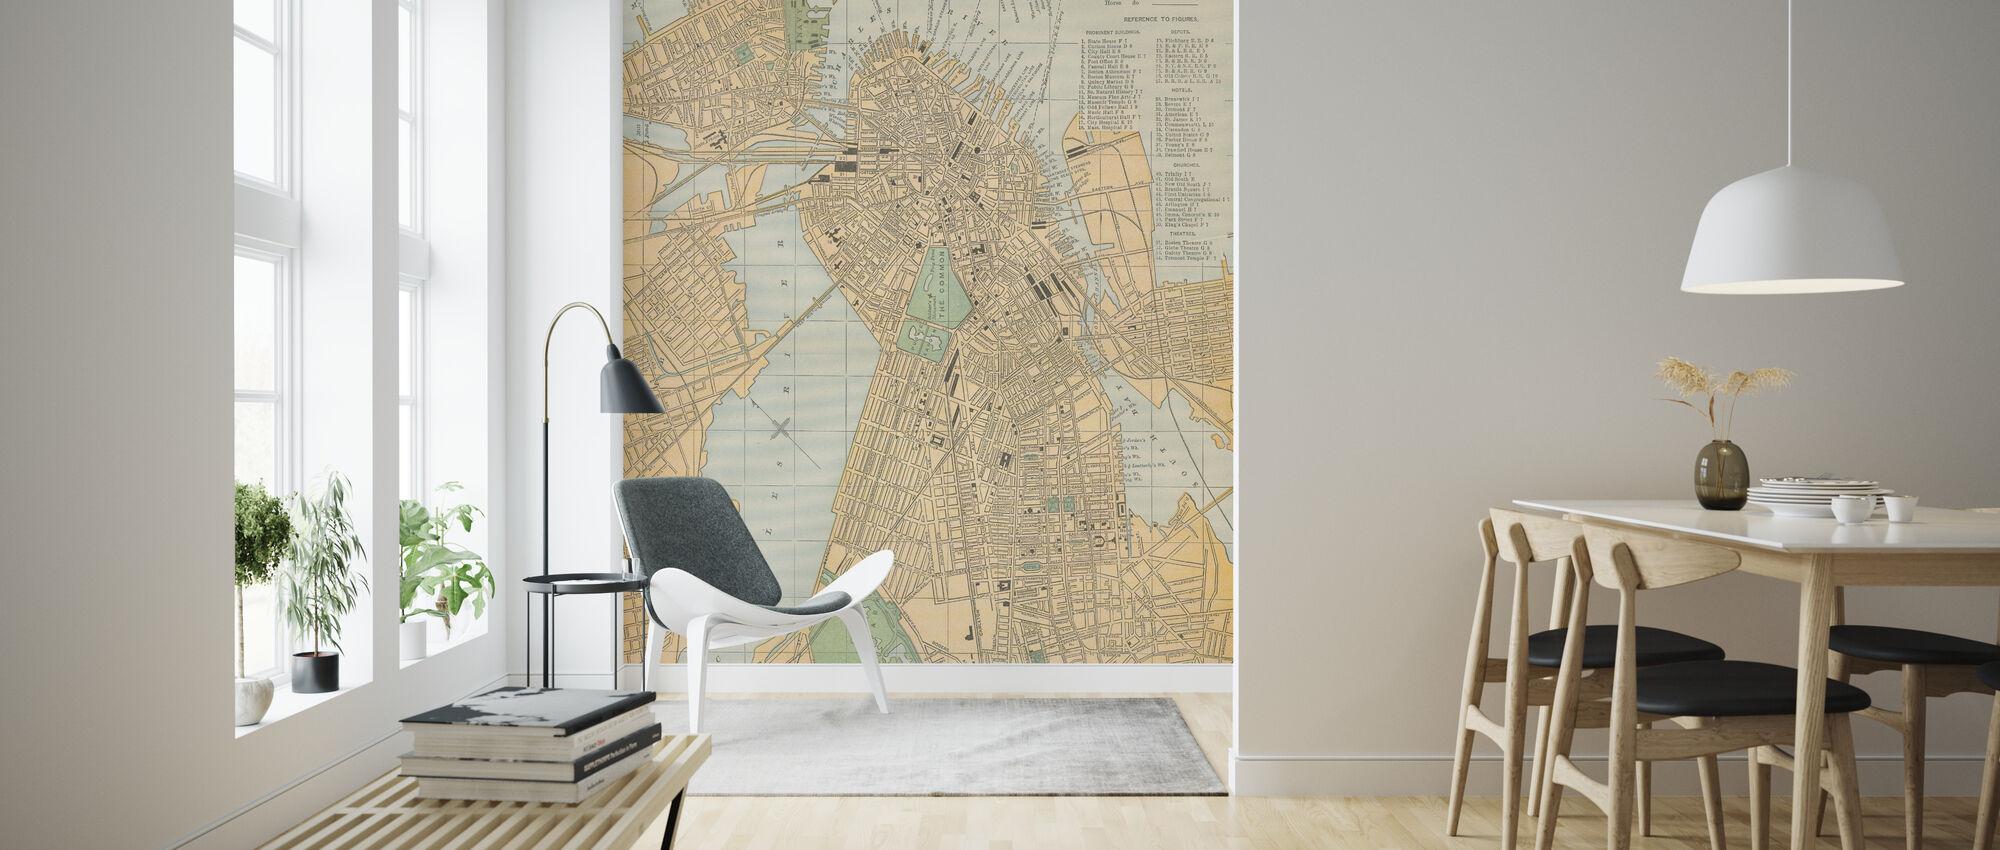 Boston Map - Wallpaper - Living Room